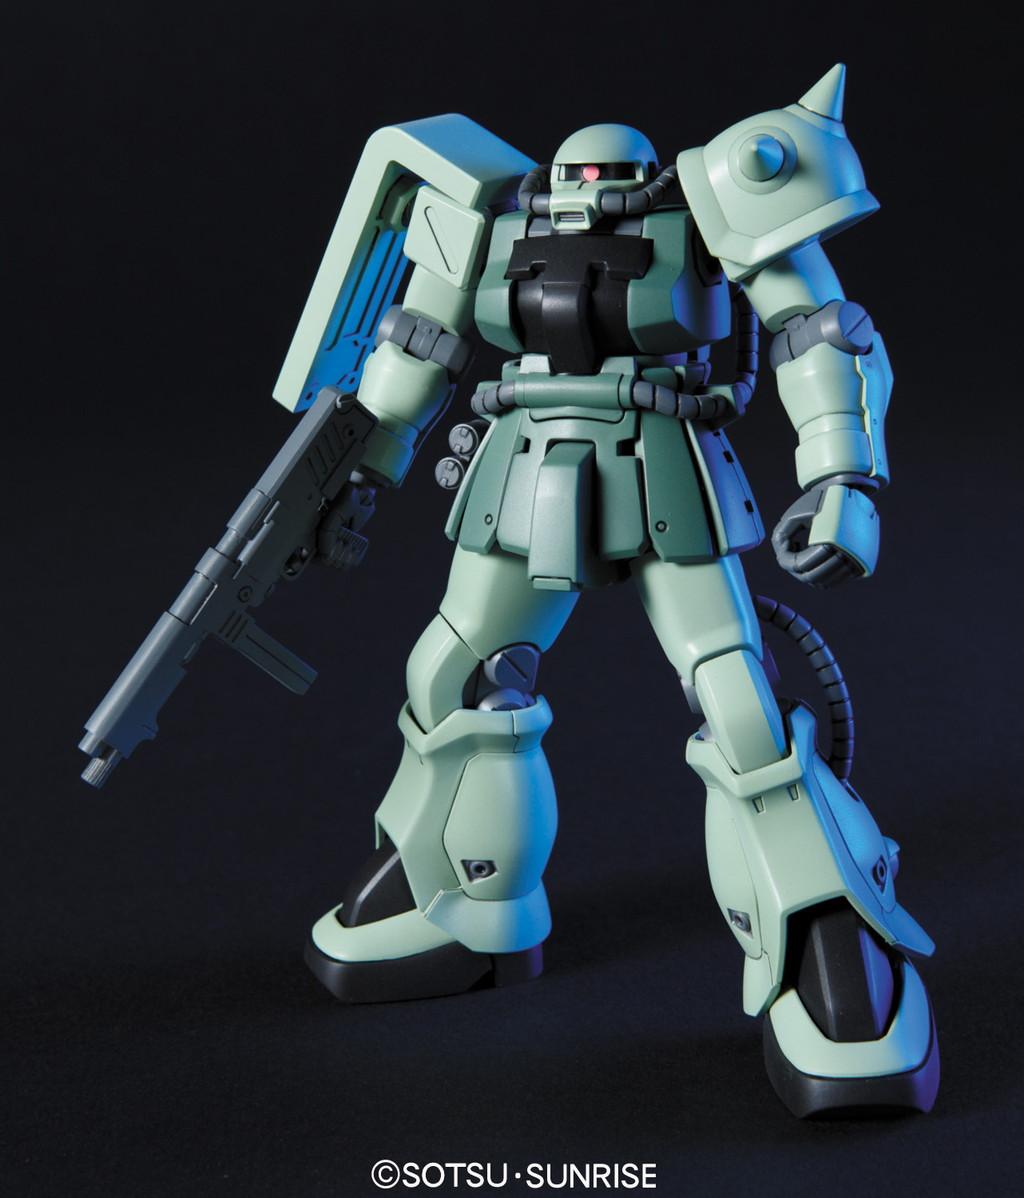 528HGUC 105 1/144 MS-06F-2 ザクIIF2型 ジオン軍仕様 [Zaku II F2 (Zeon Version)]